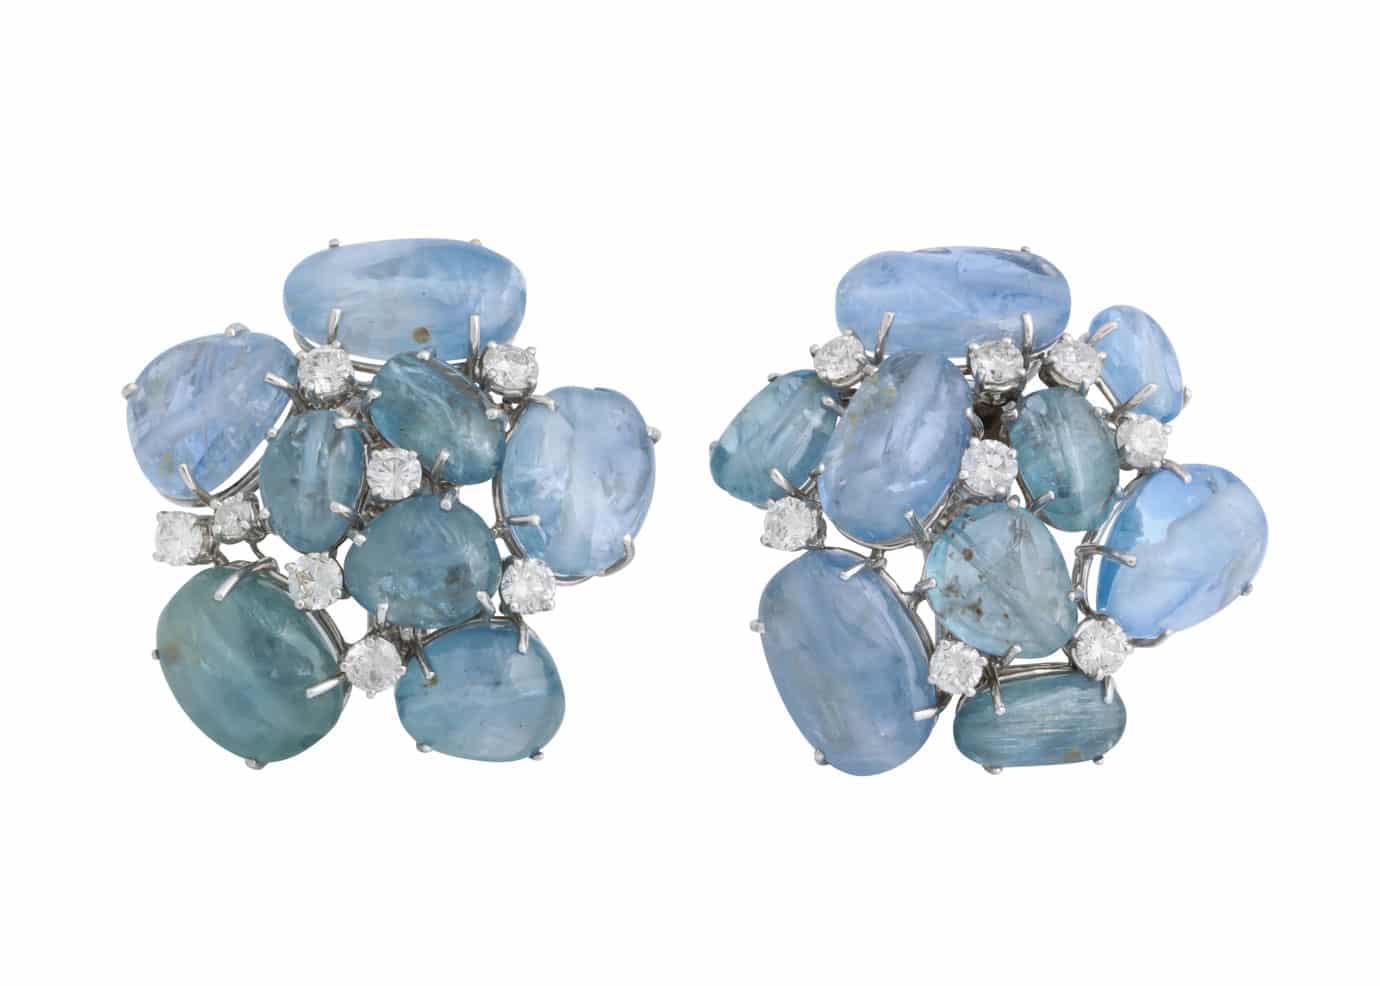 seaman schepps large sapphire earrings